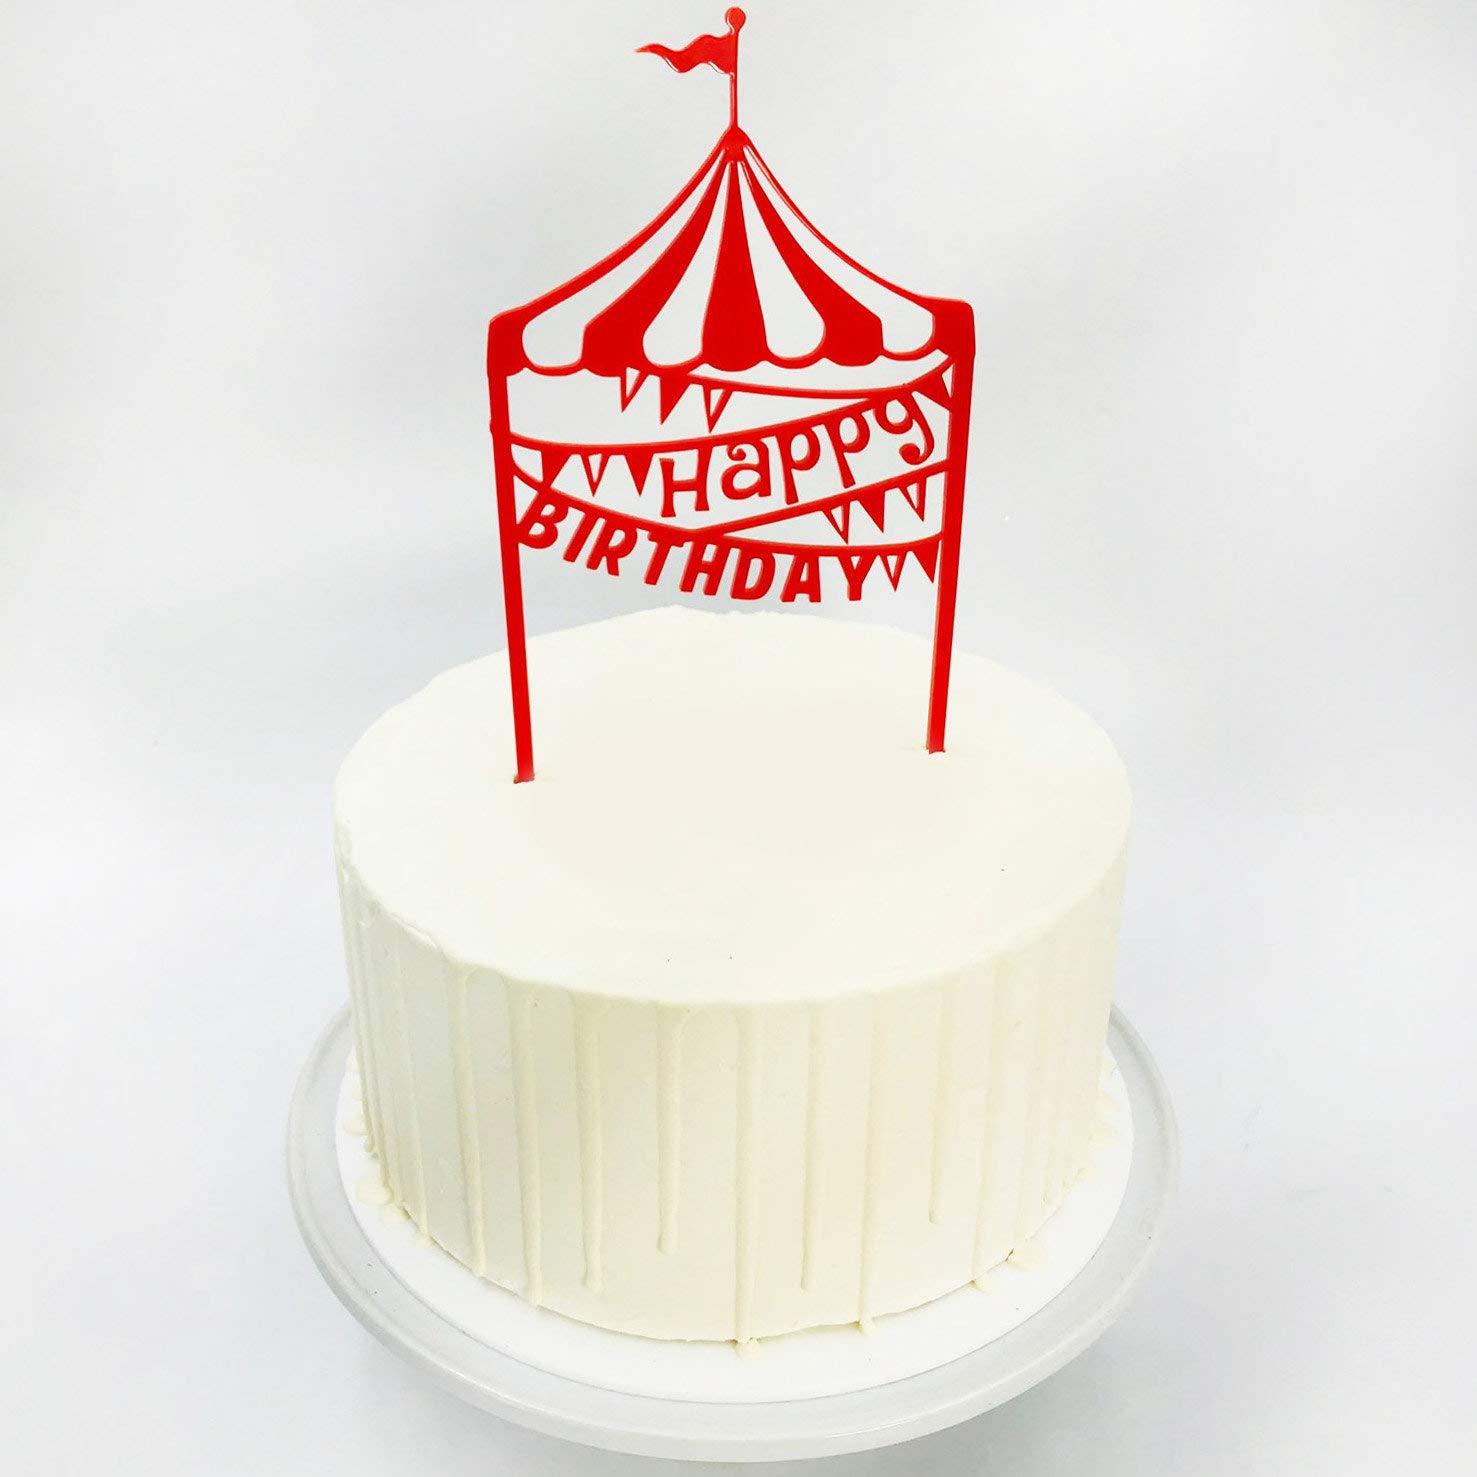 Strange Happy Birthday Circus Themed Cake Topper Amazon Co Uk Kitchen Home Funny Birthday Cards Online Elaedamsfinfo